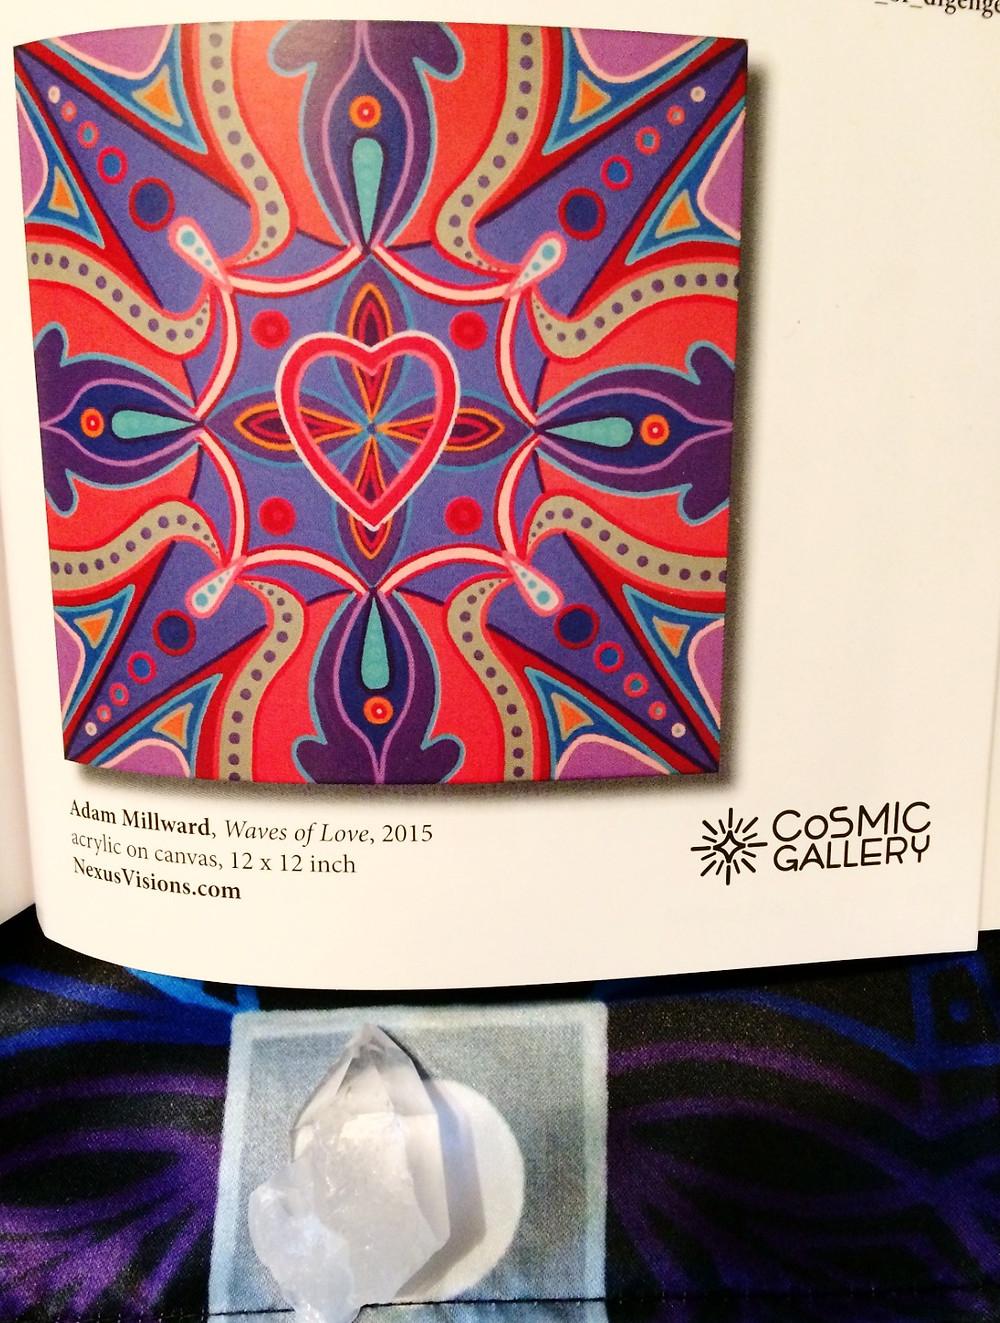 Waves of Love Mandala Painting by Adam Millward